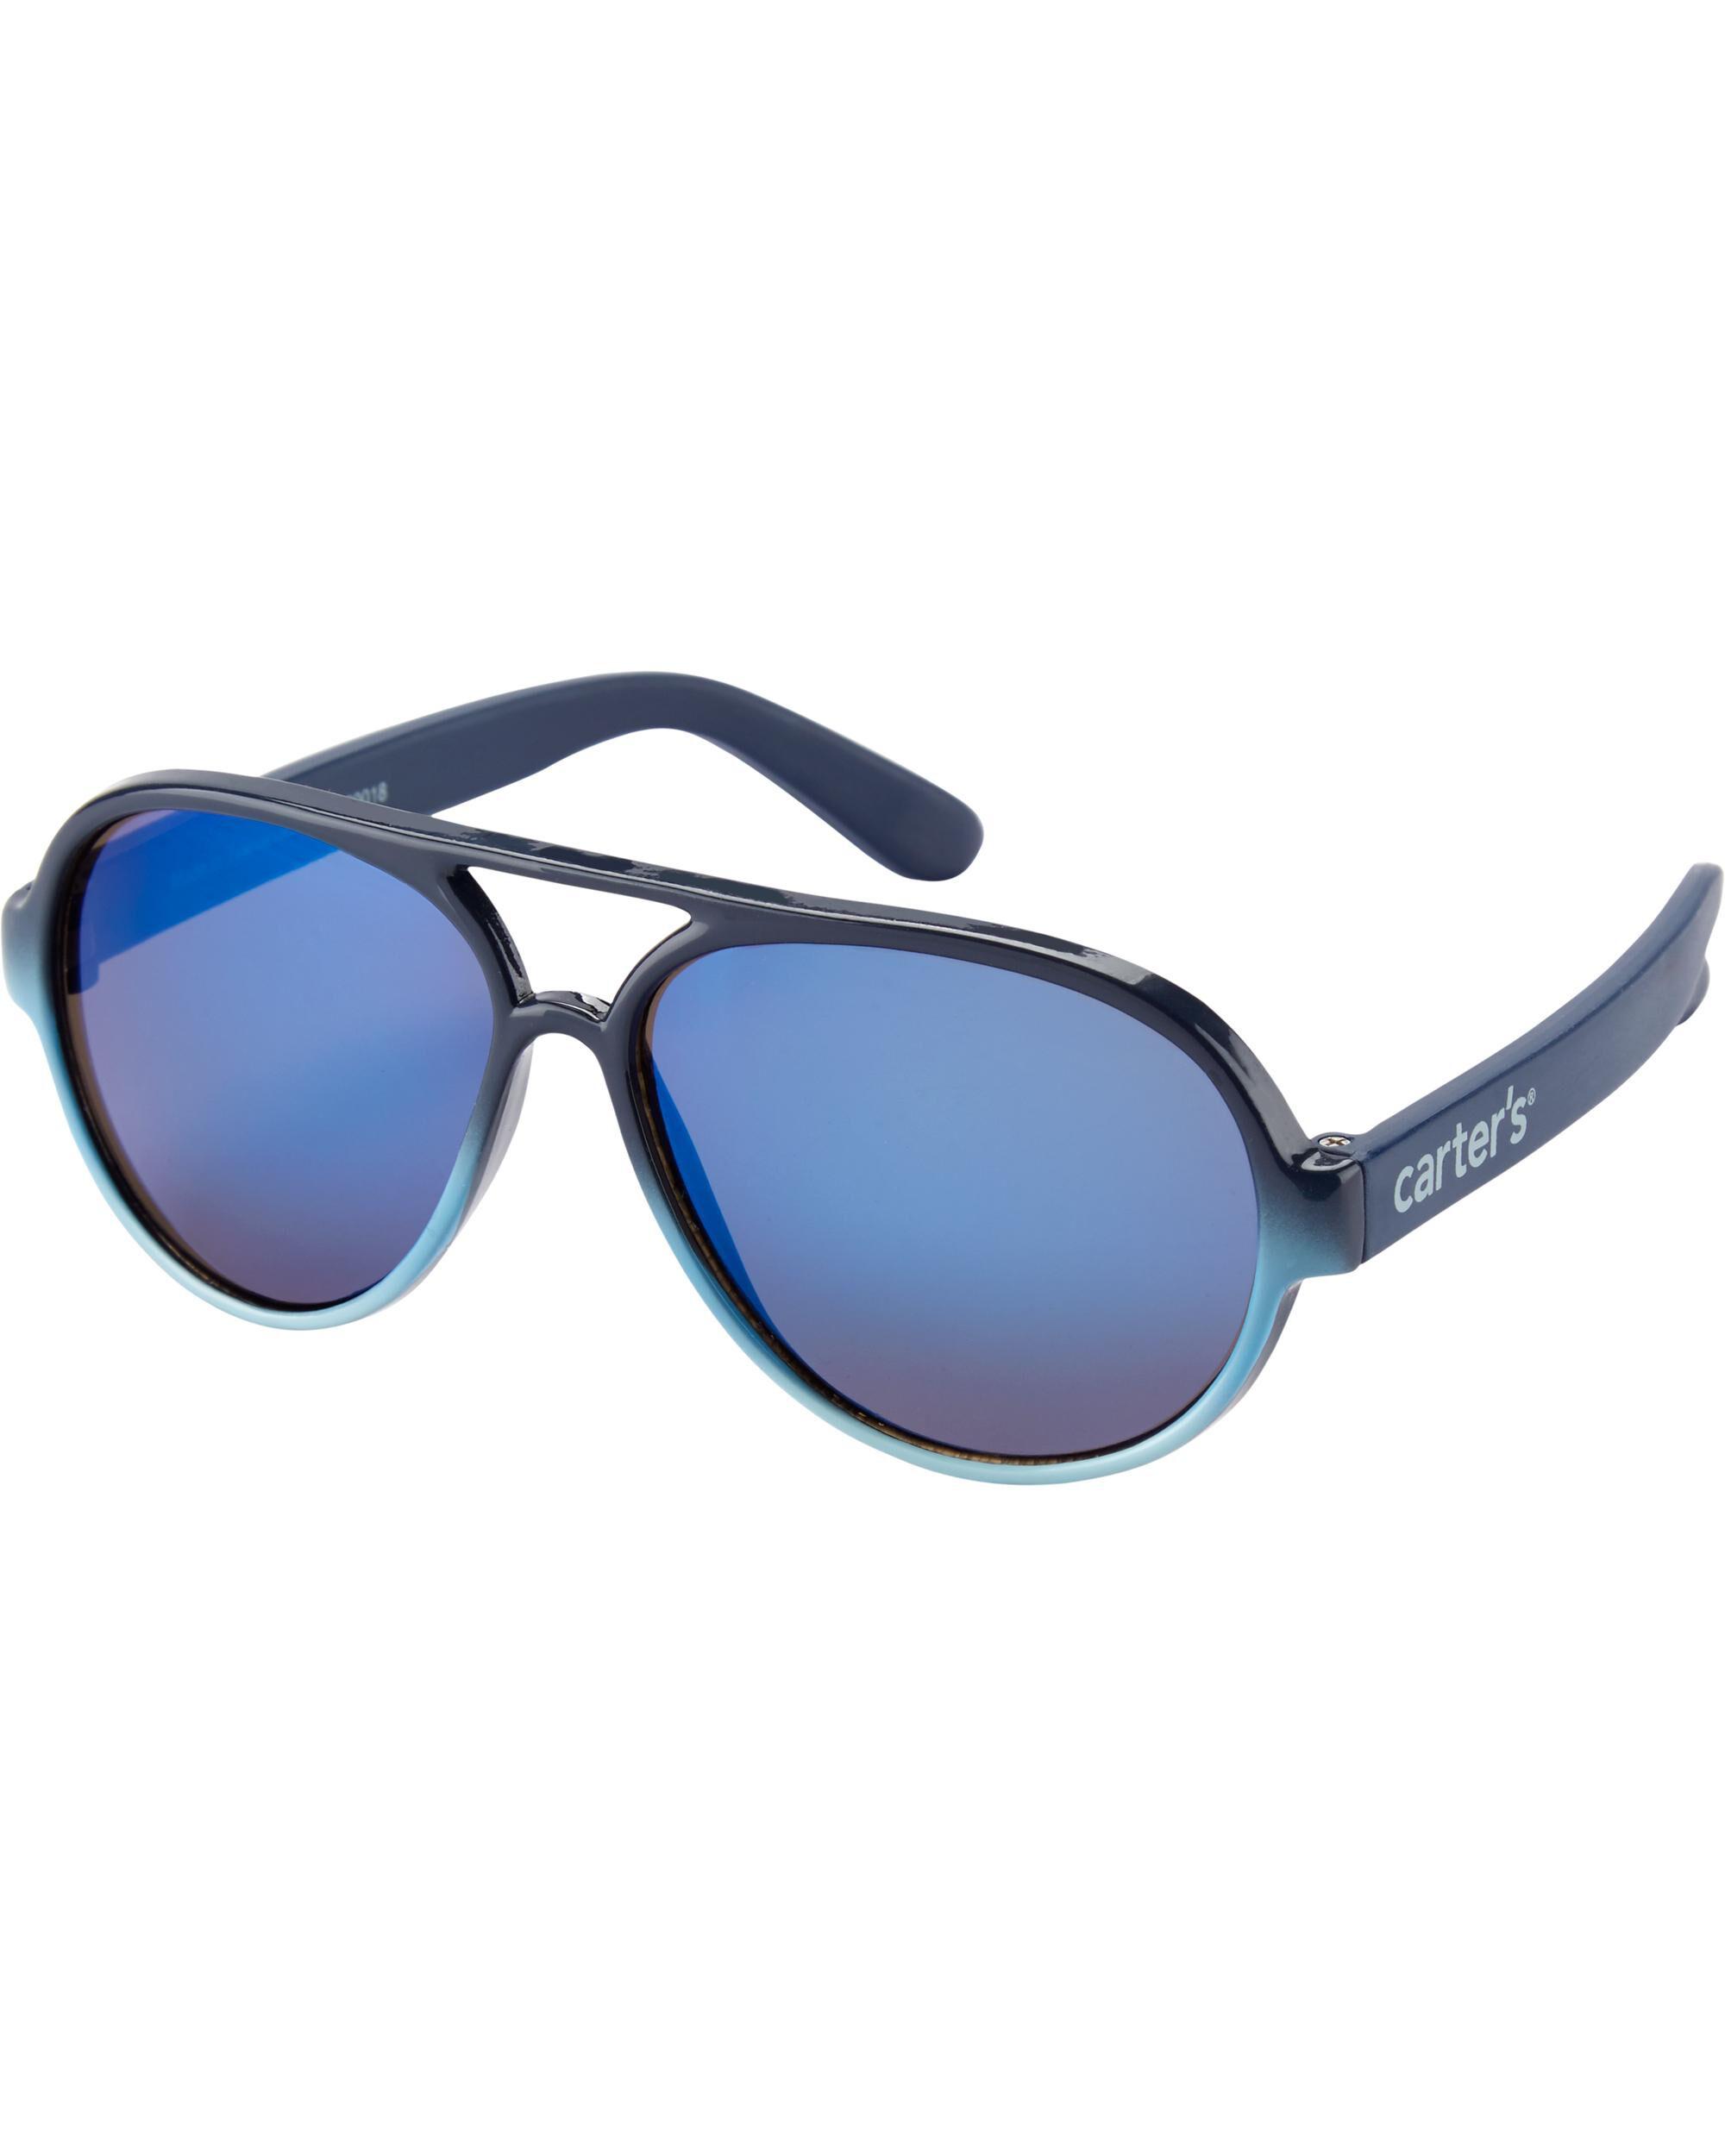 e654360b6f Aviator Sunglasses. Loading zoom